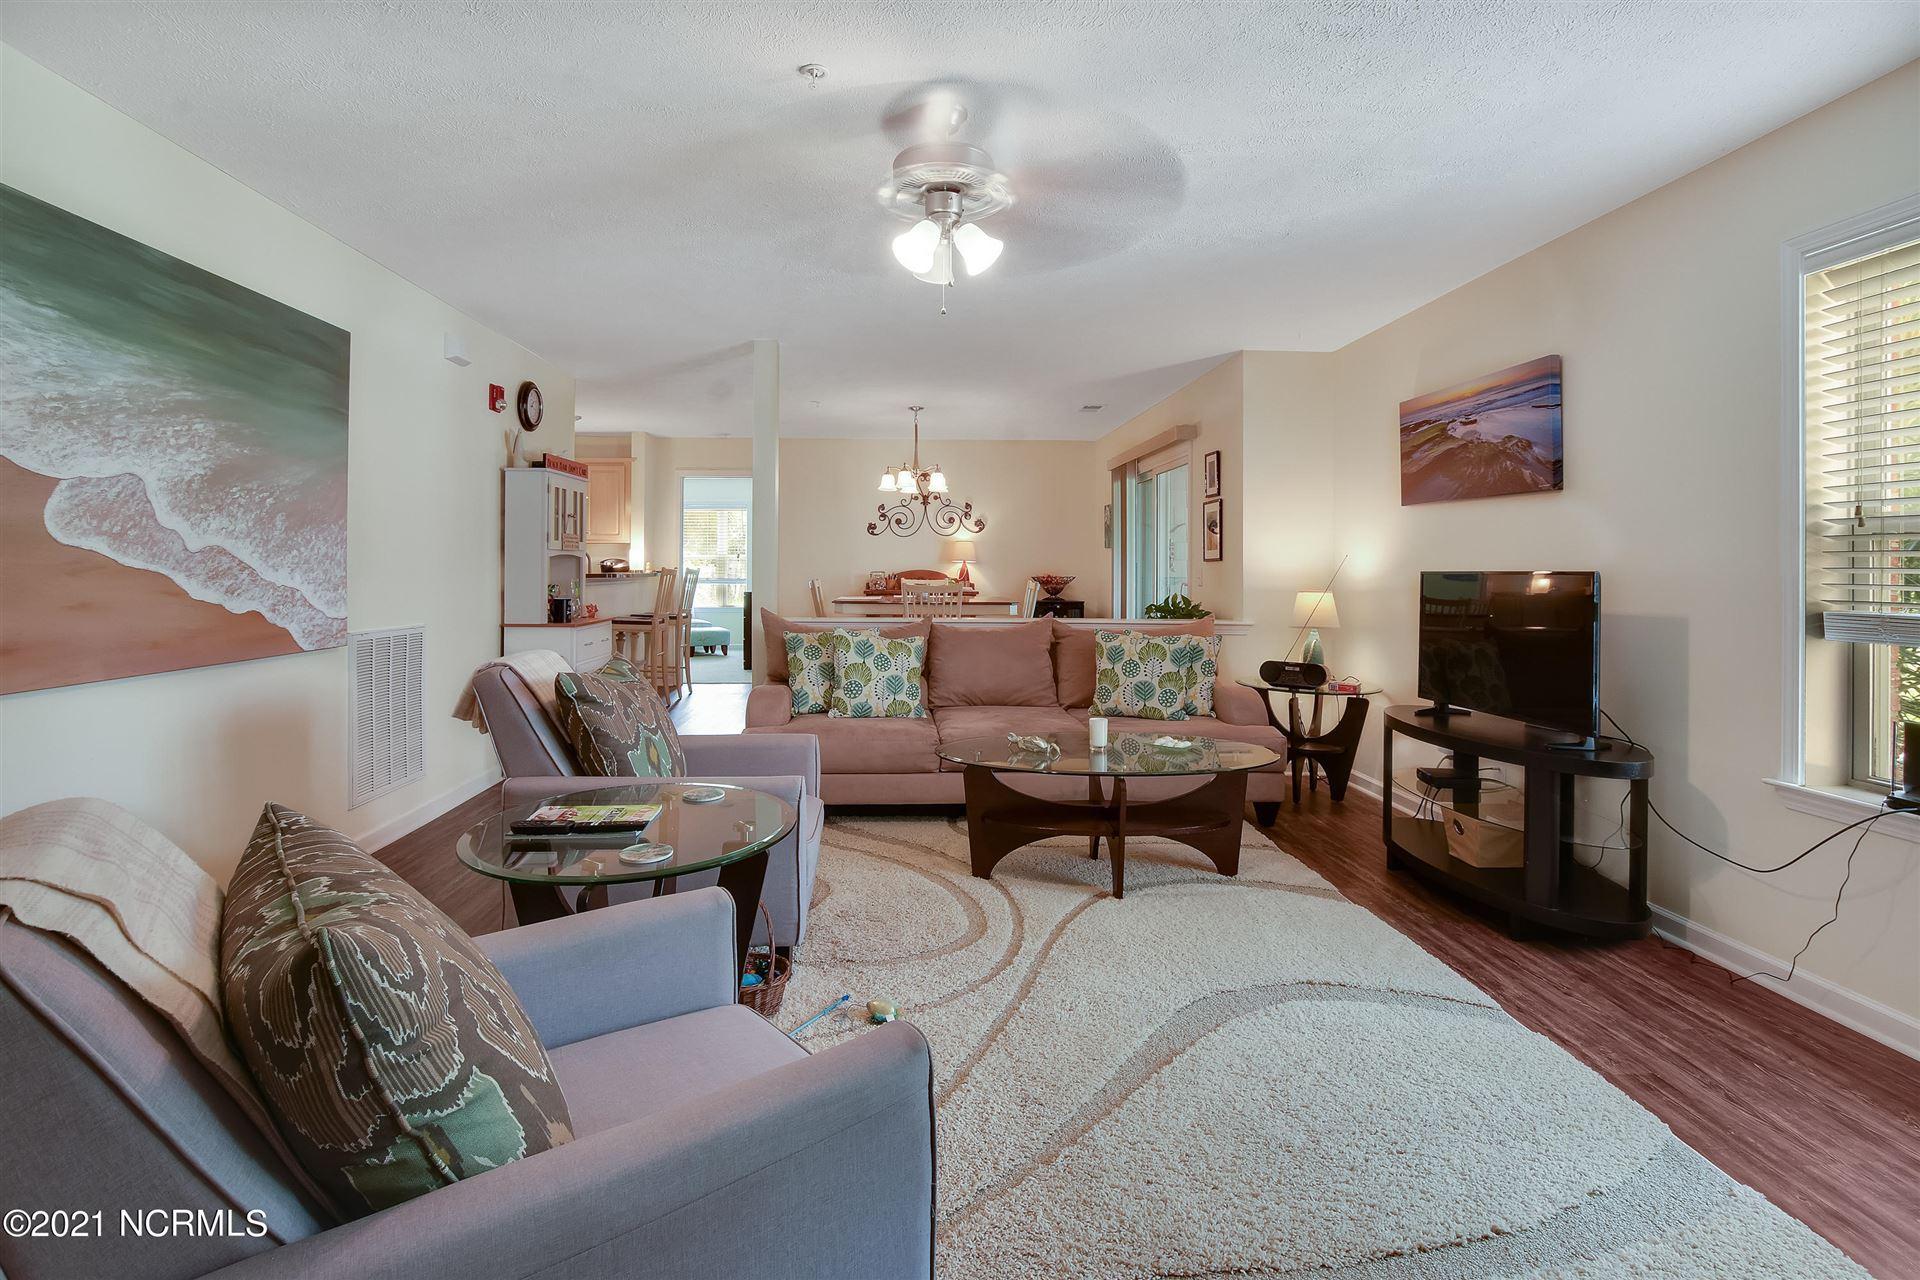 Photo of 633 Spencer Farlow Drive #11, Carolina Beach, NC 28428 (MLS # 100286573)